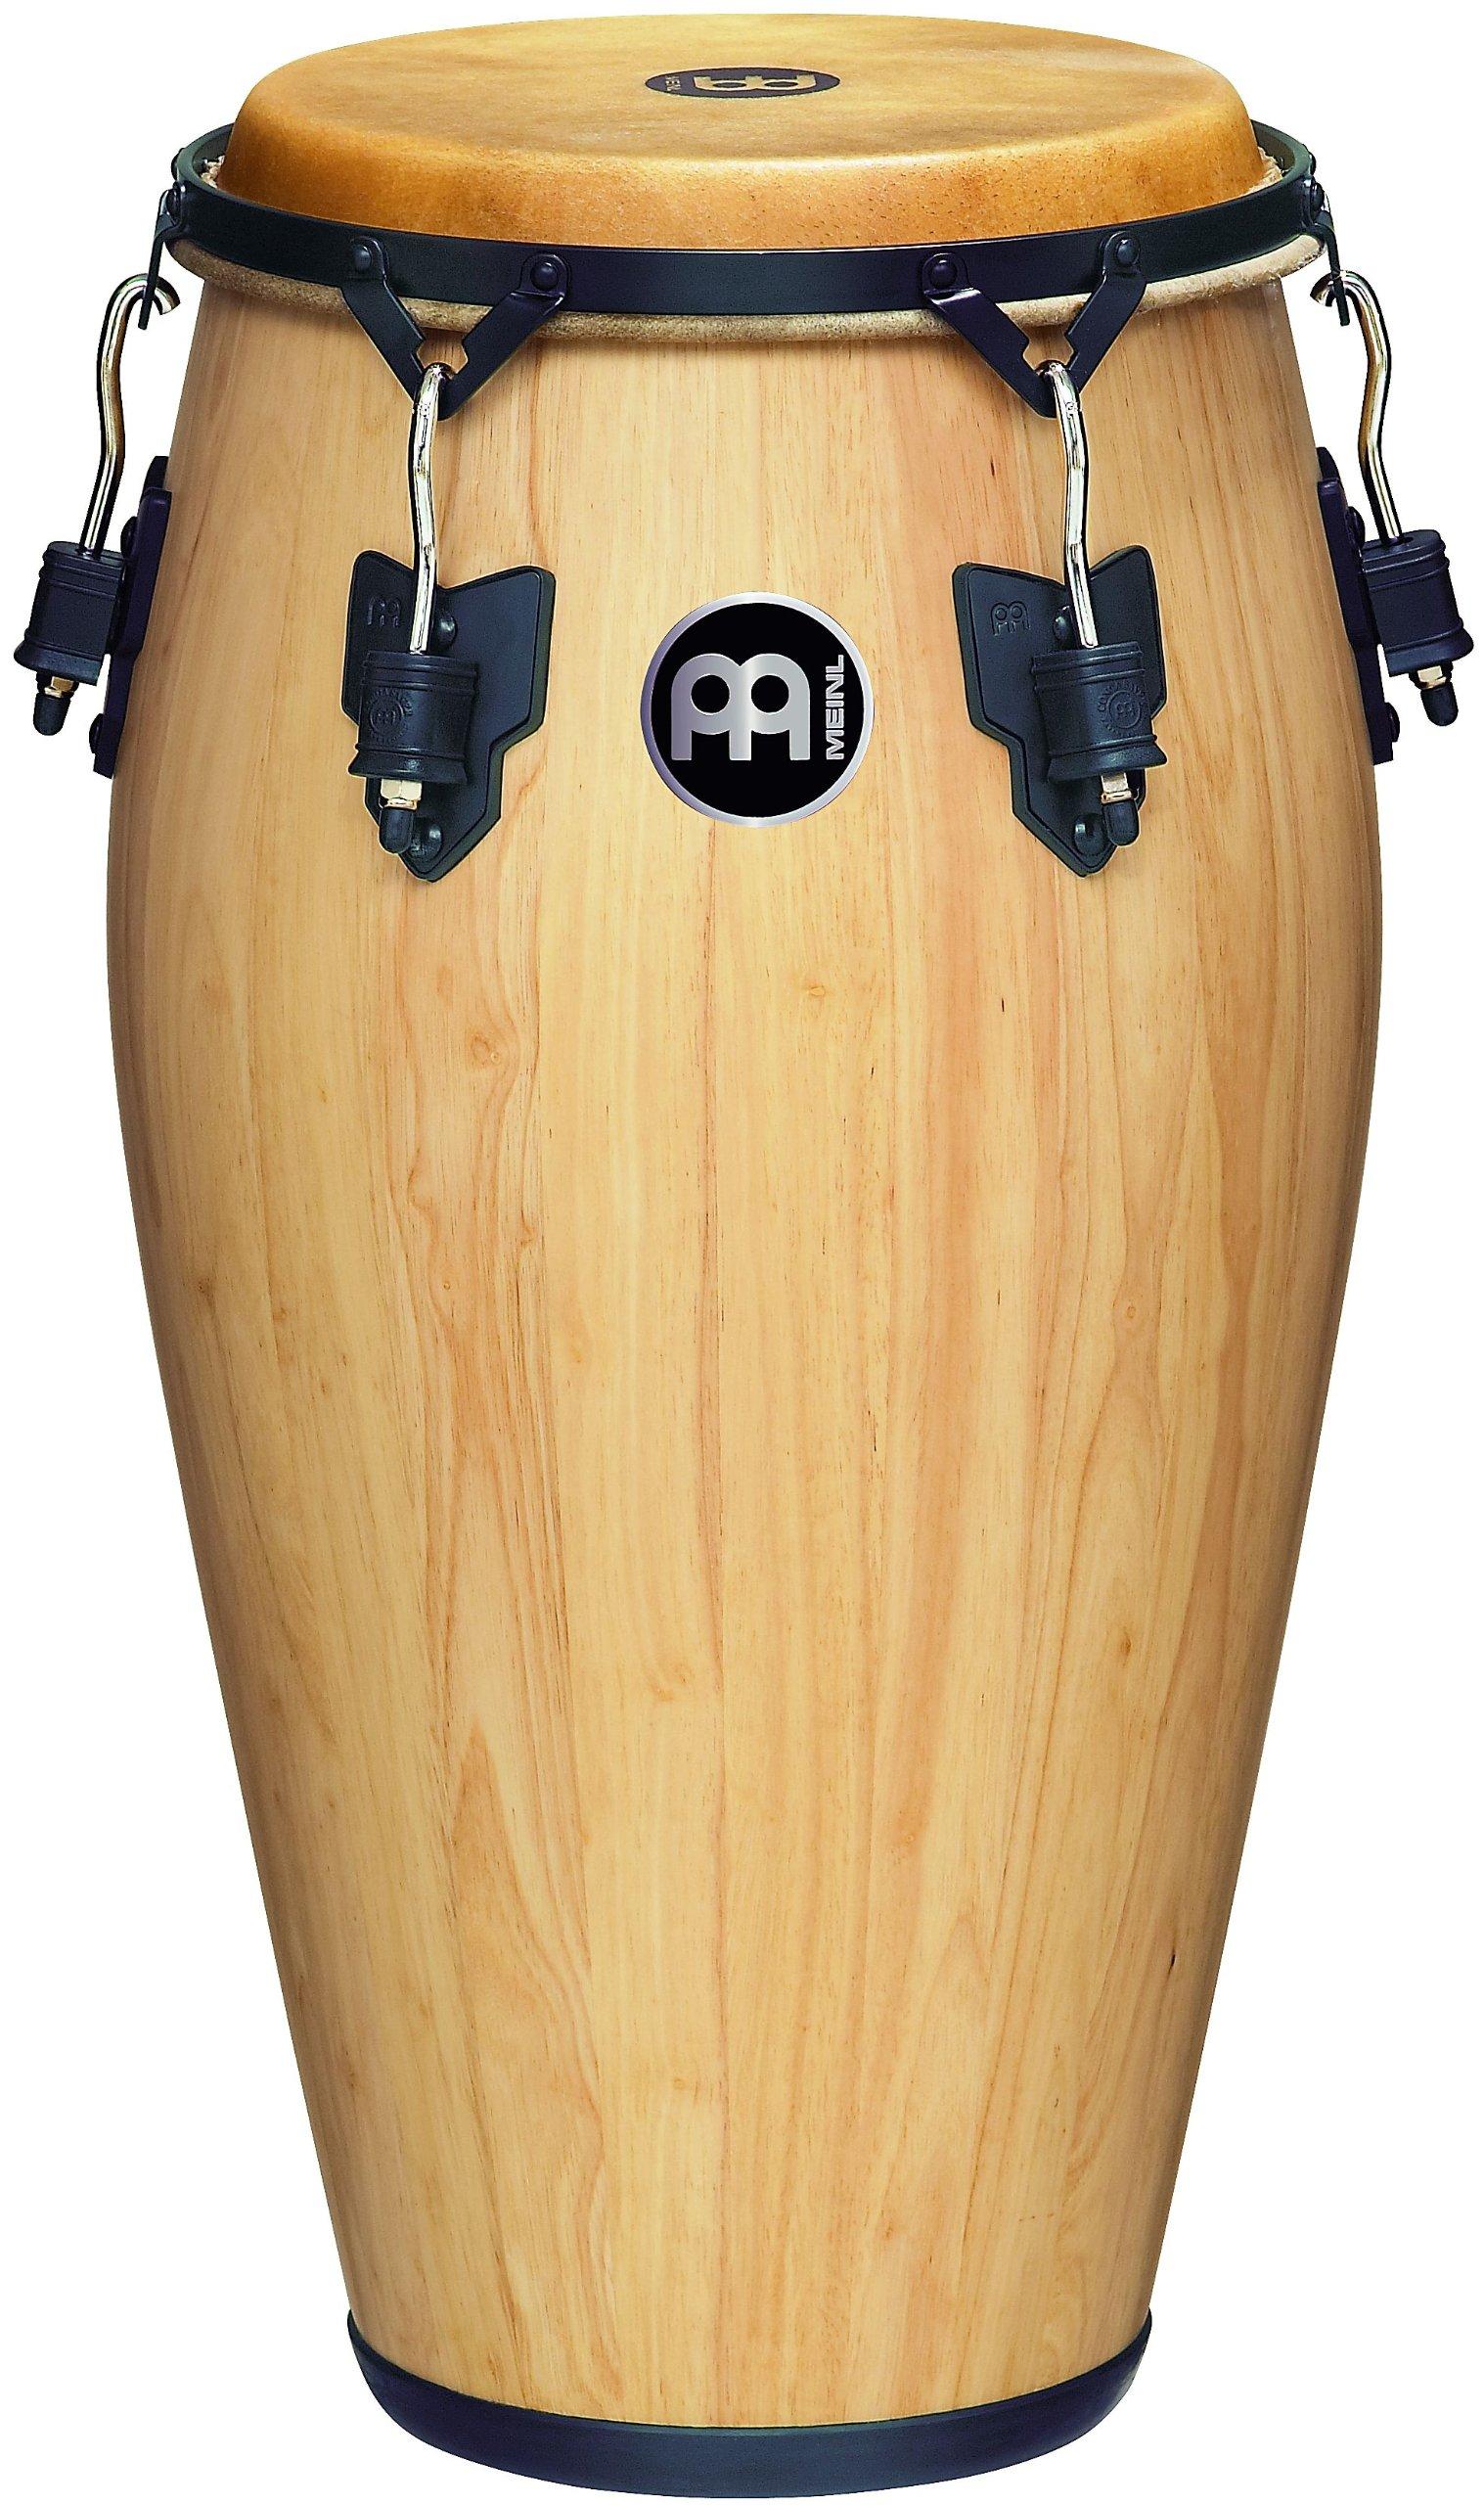 Meinl Percussion LC1134NT-M Artist Series Luis Conte Signature 11 3/4-Inch Conga, Natural Finish by Meinl Percussion